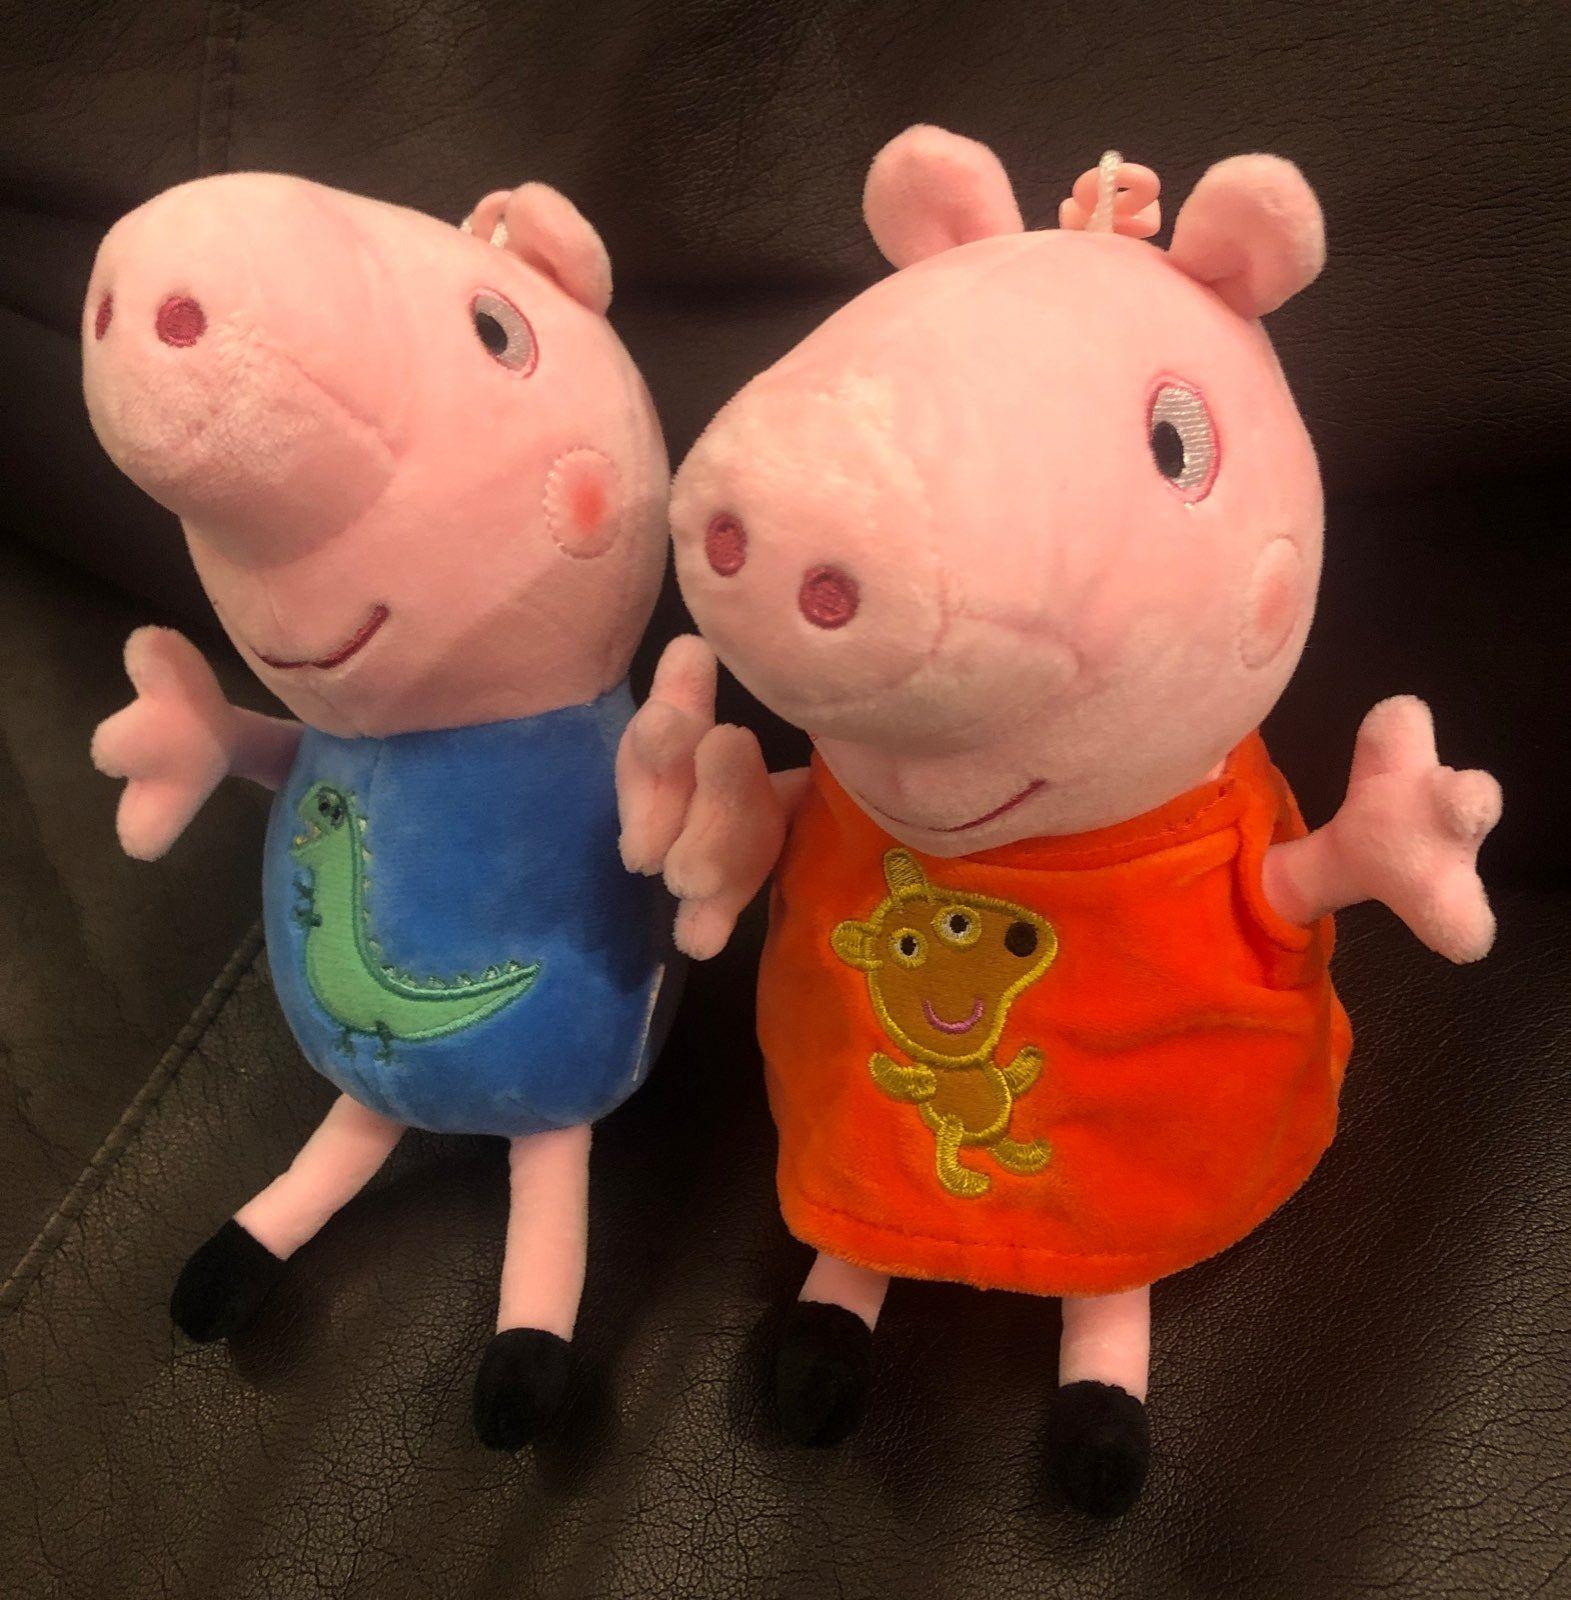 Peppa And George Pig Plush Set Used Mercari Pig Plush Plush Stuffed Animals George Pig [ 1600 x 1571 Pixel ]